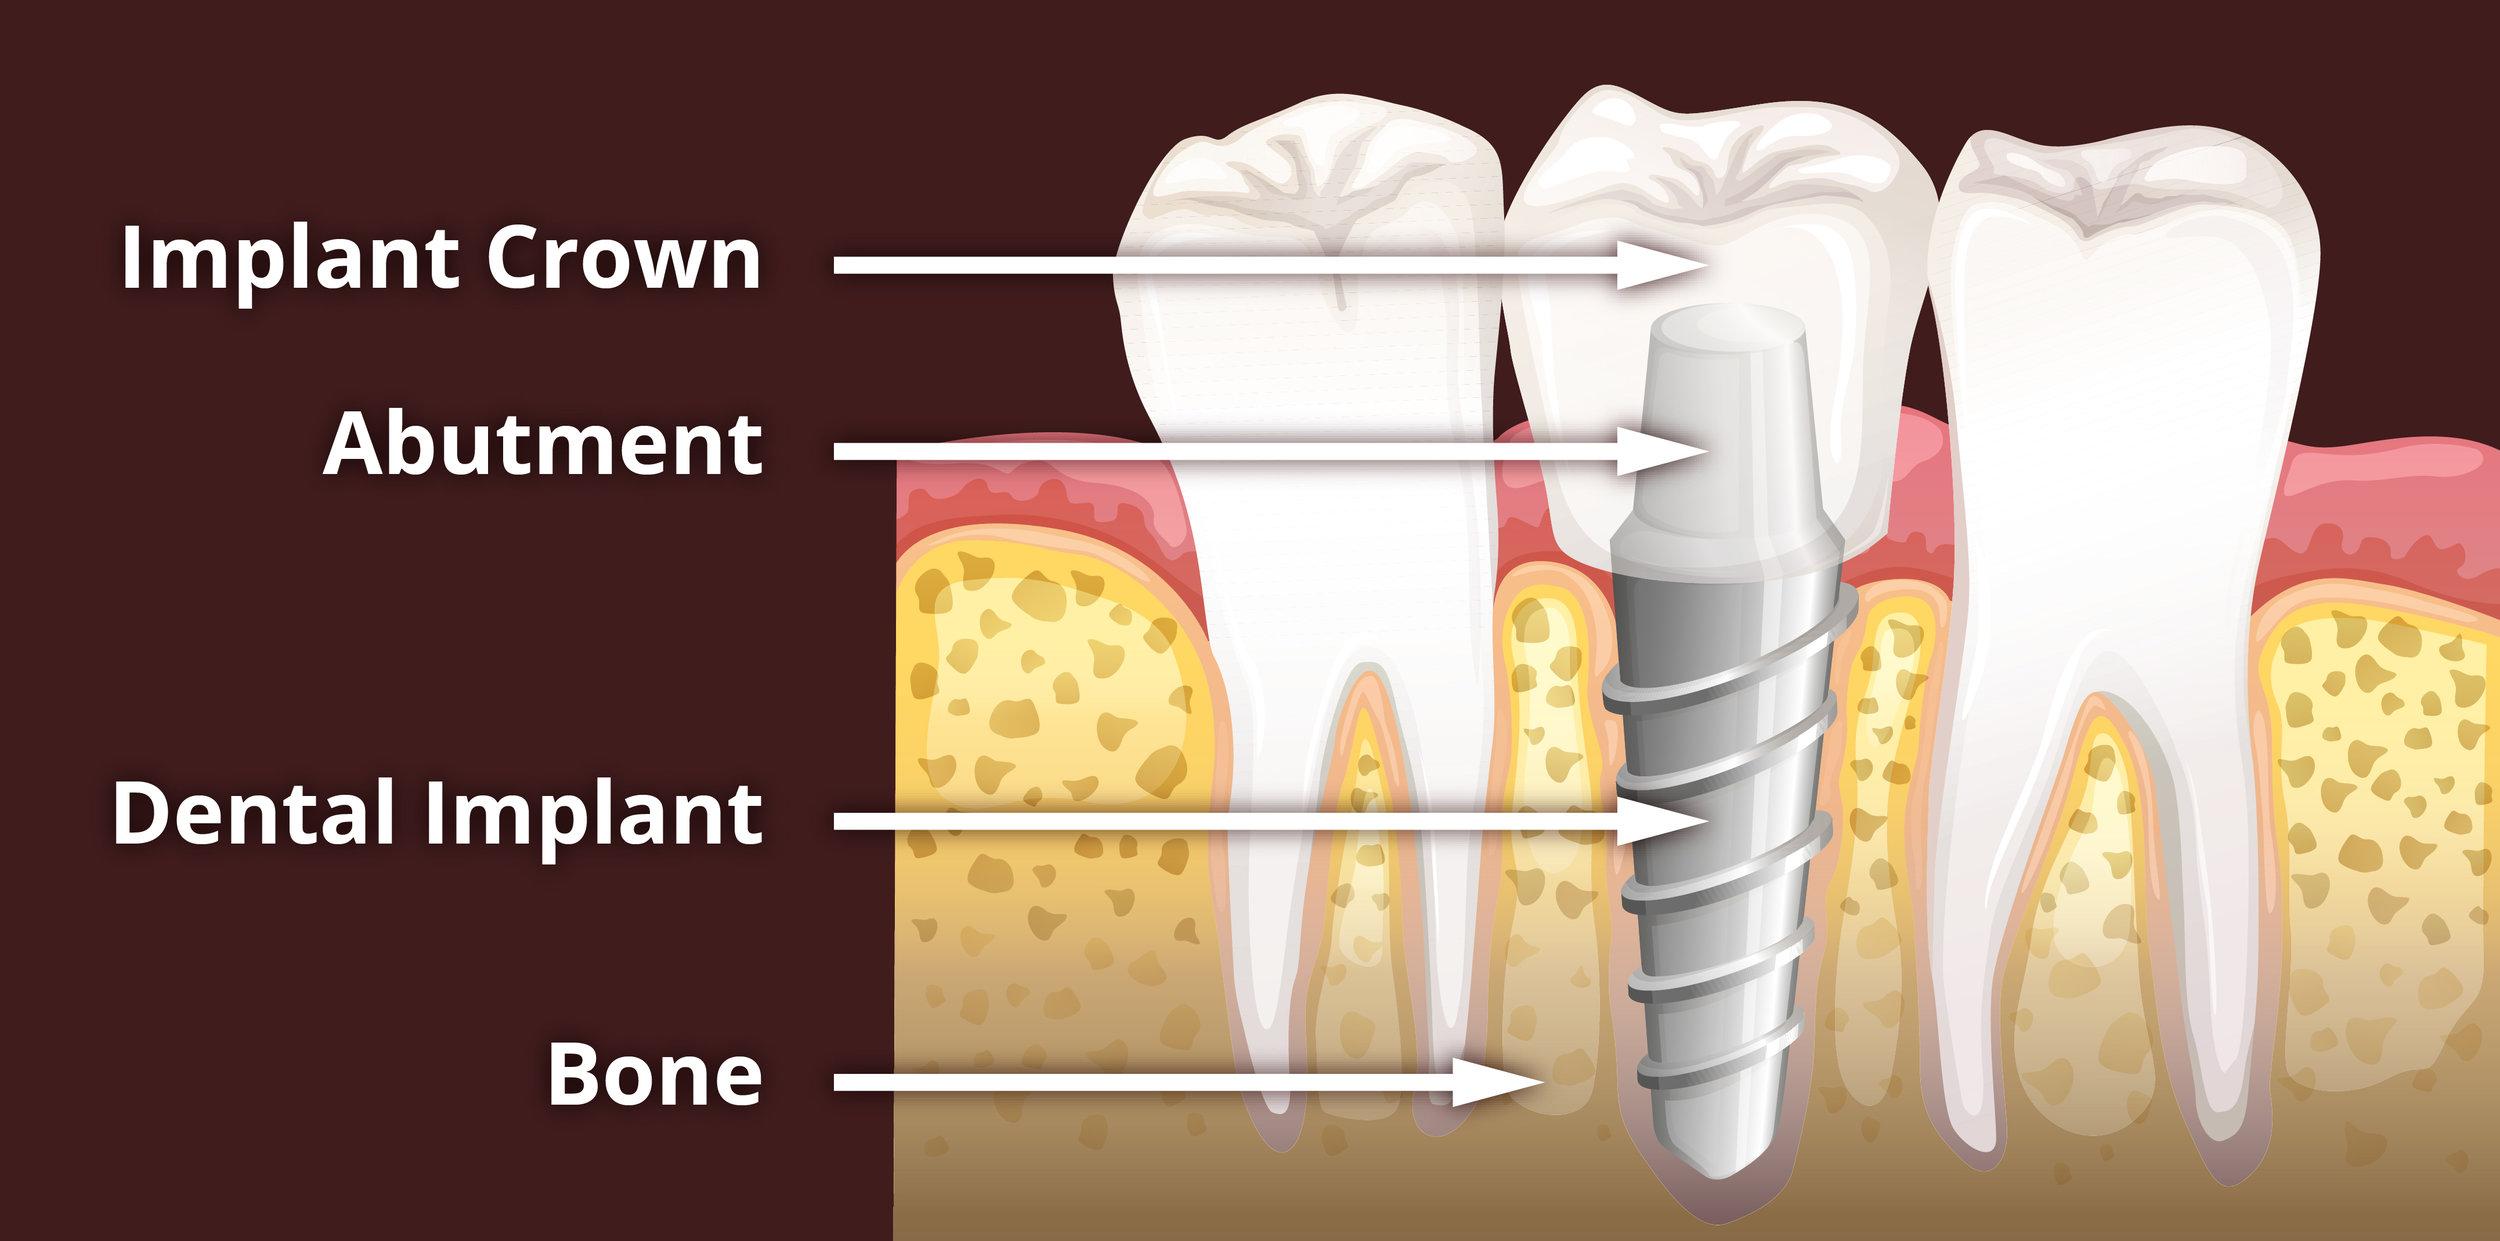 Dental-Implant-Anatomy-01.jpg